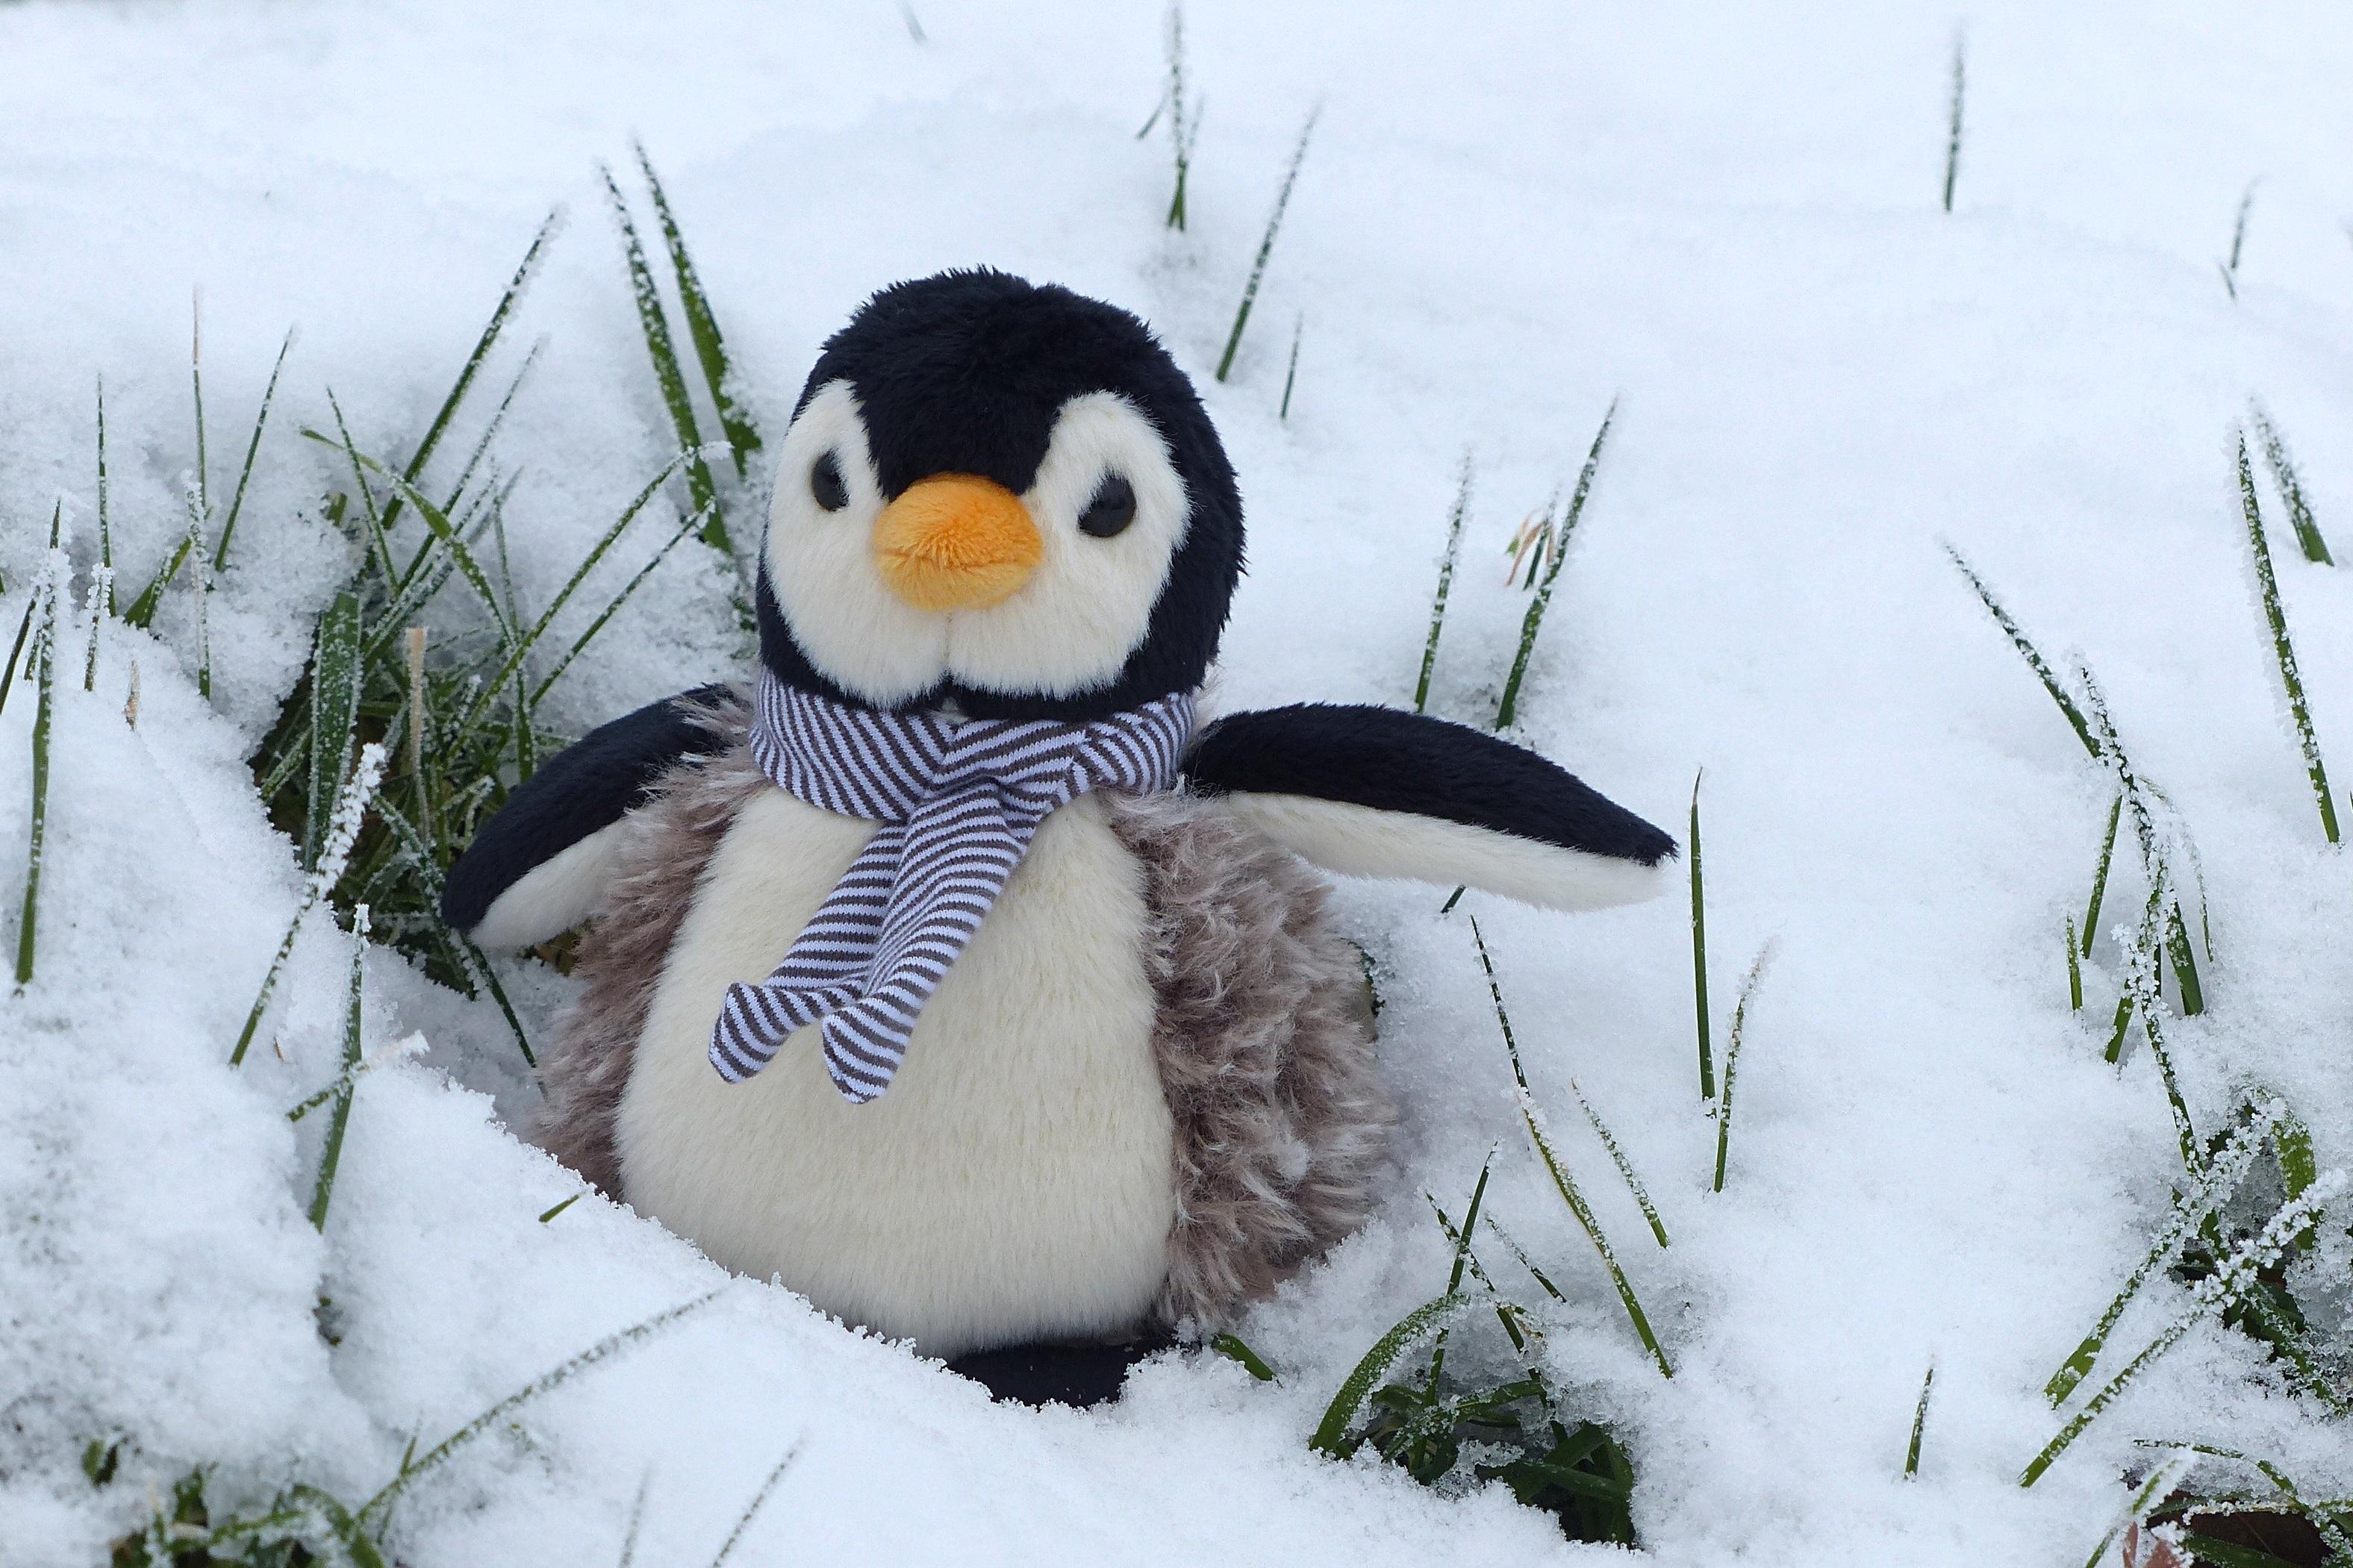 Snow Cold Winter Bird Cute Weather Penguin Snowman Stuffed Animal Flightless